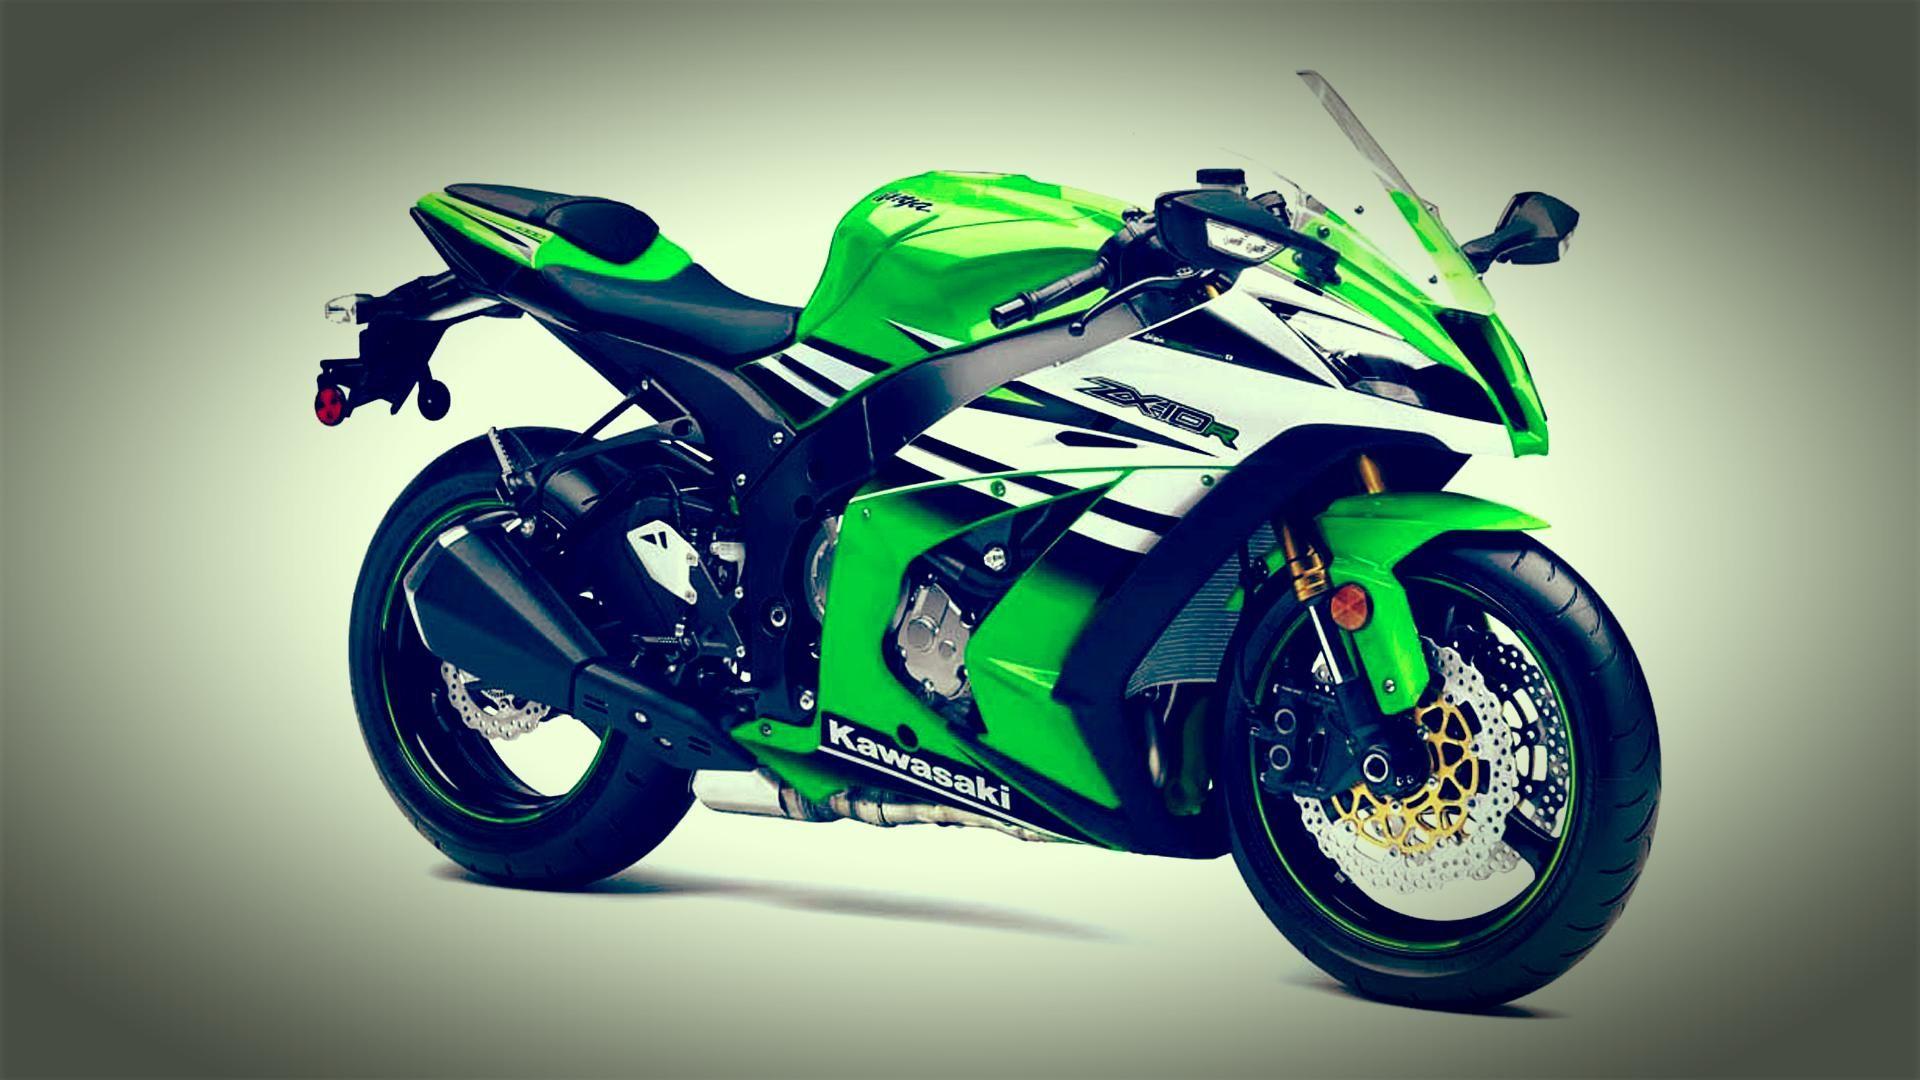 Kawasaki Ninja 1000 Wallpaper For Iphone Motorcycle Wallpaper Ninja Motorcycle Hd Motorcycles